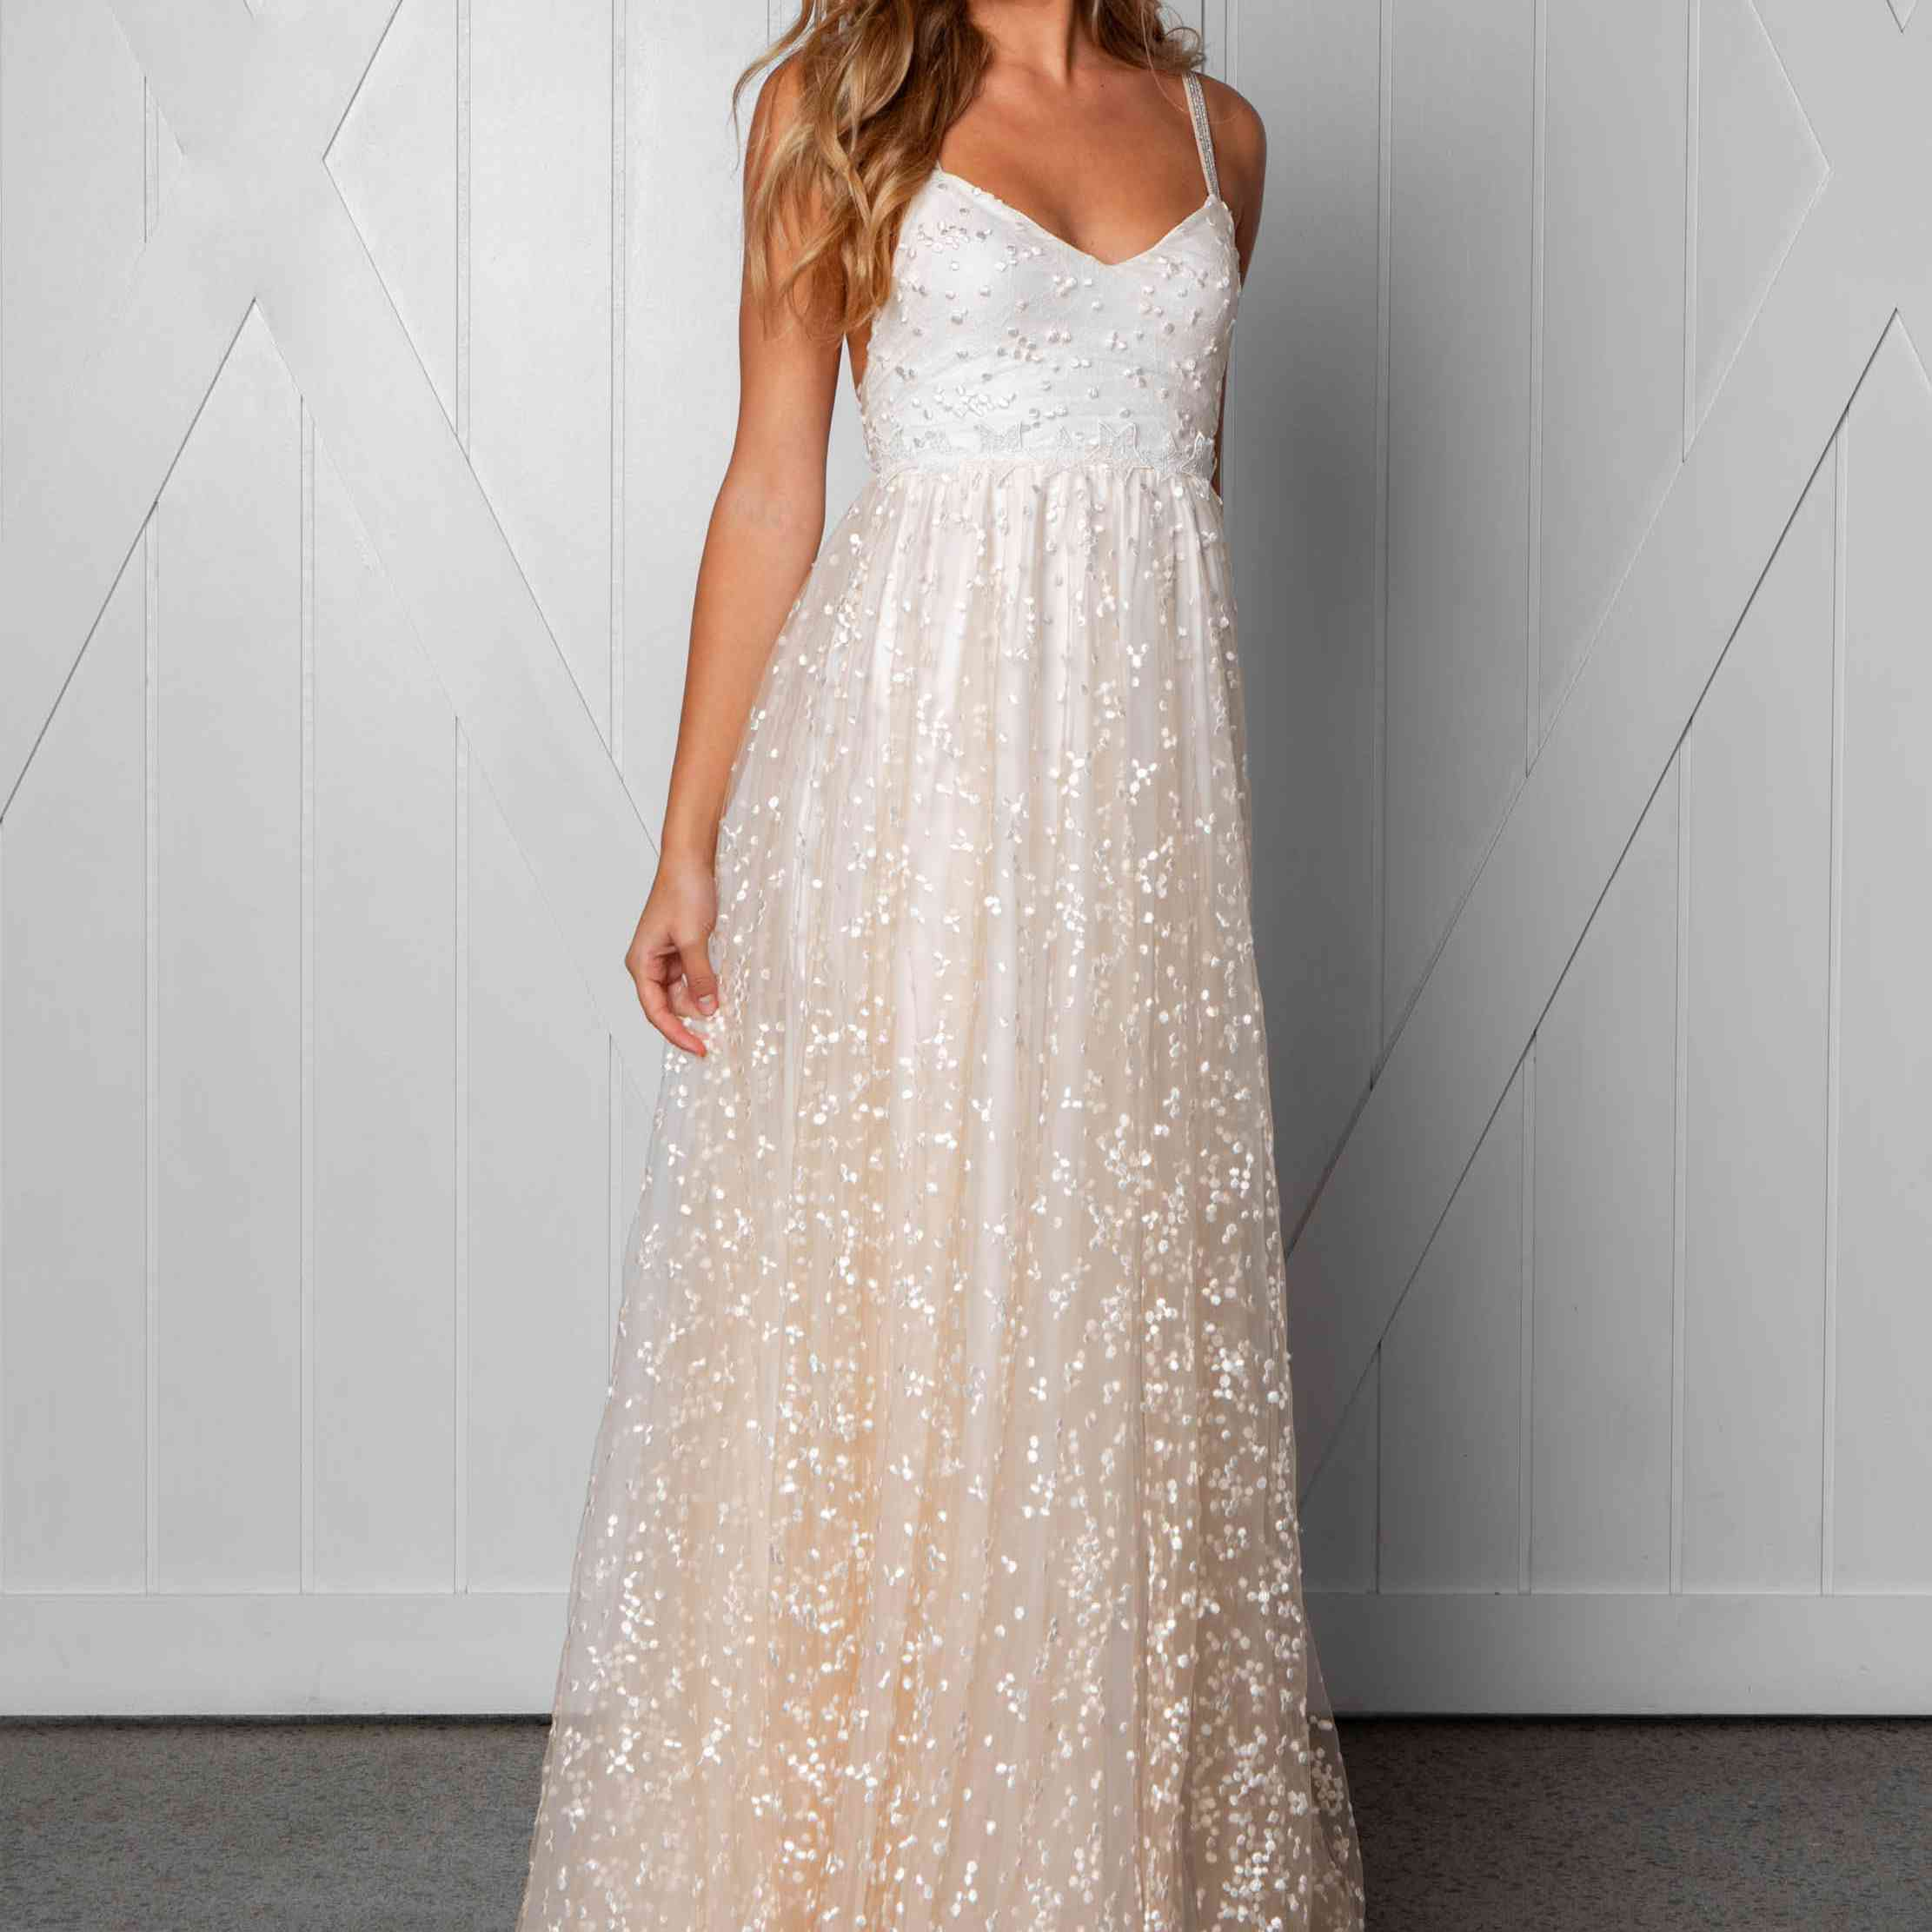 Menha blush wedding dress